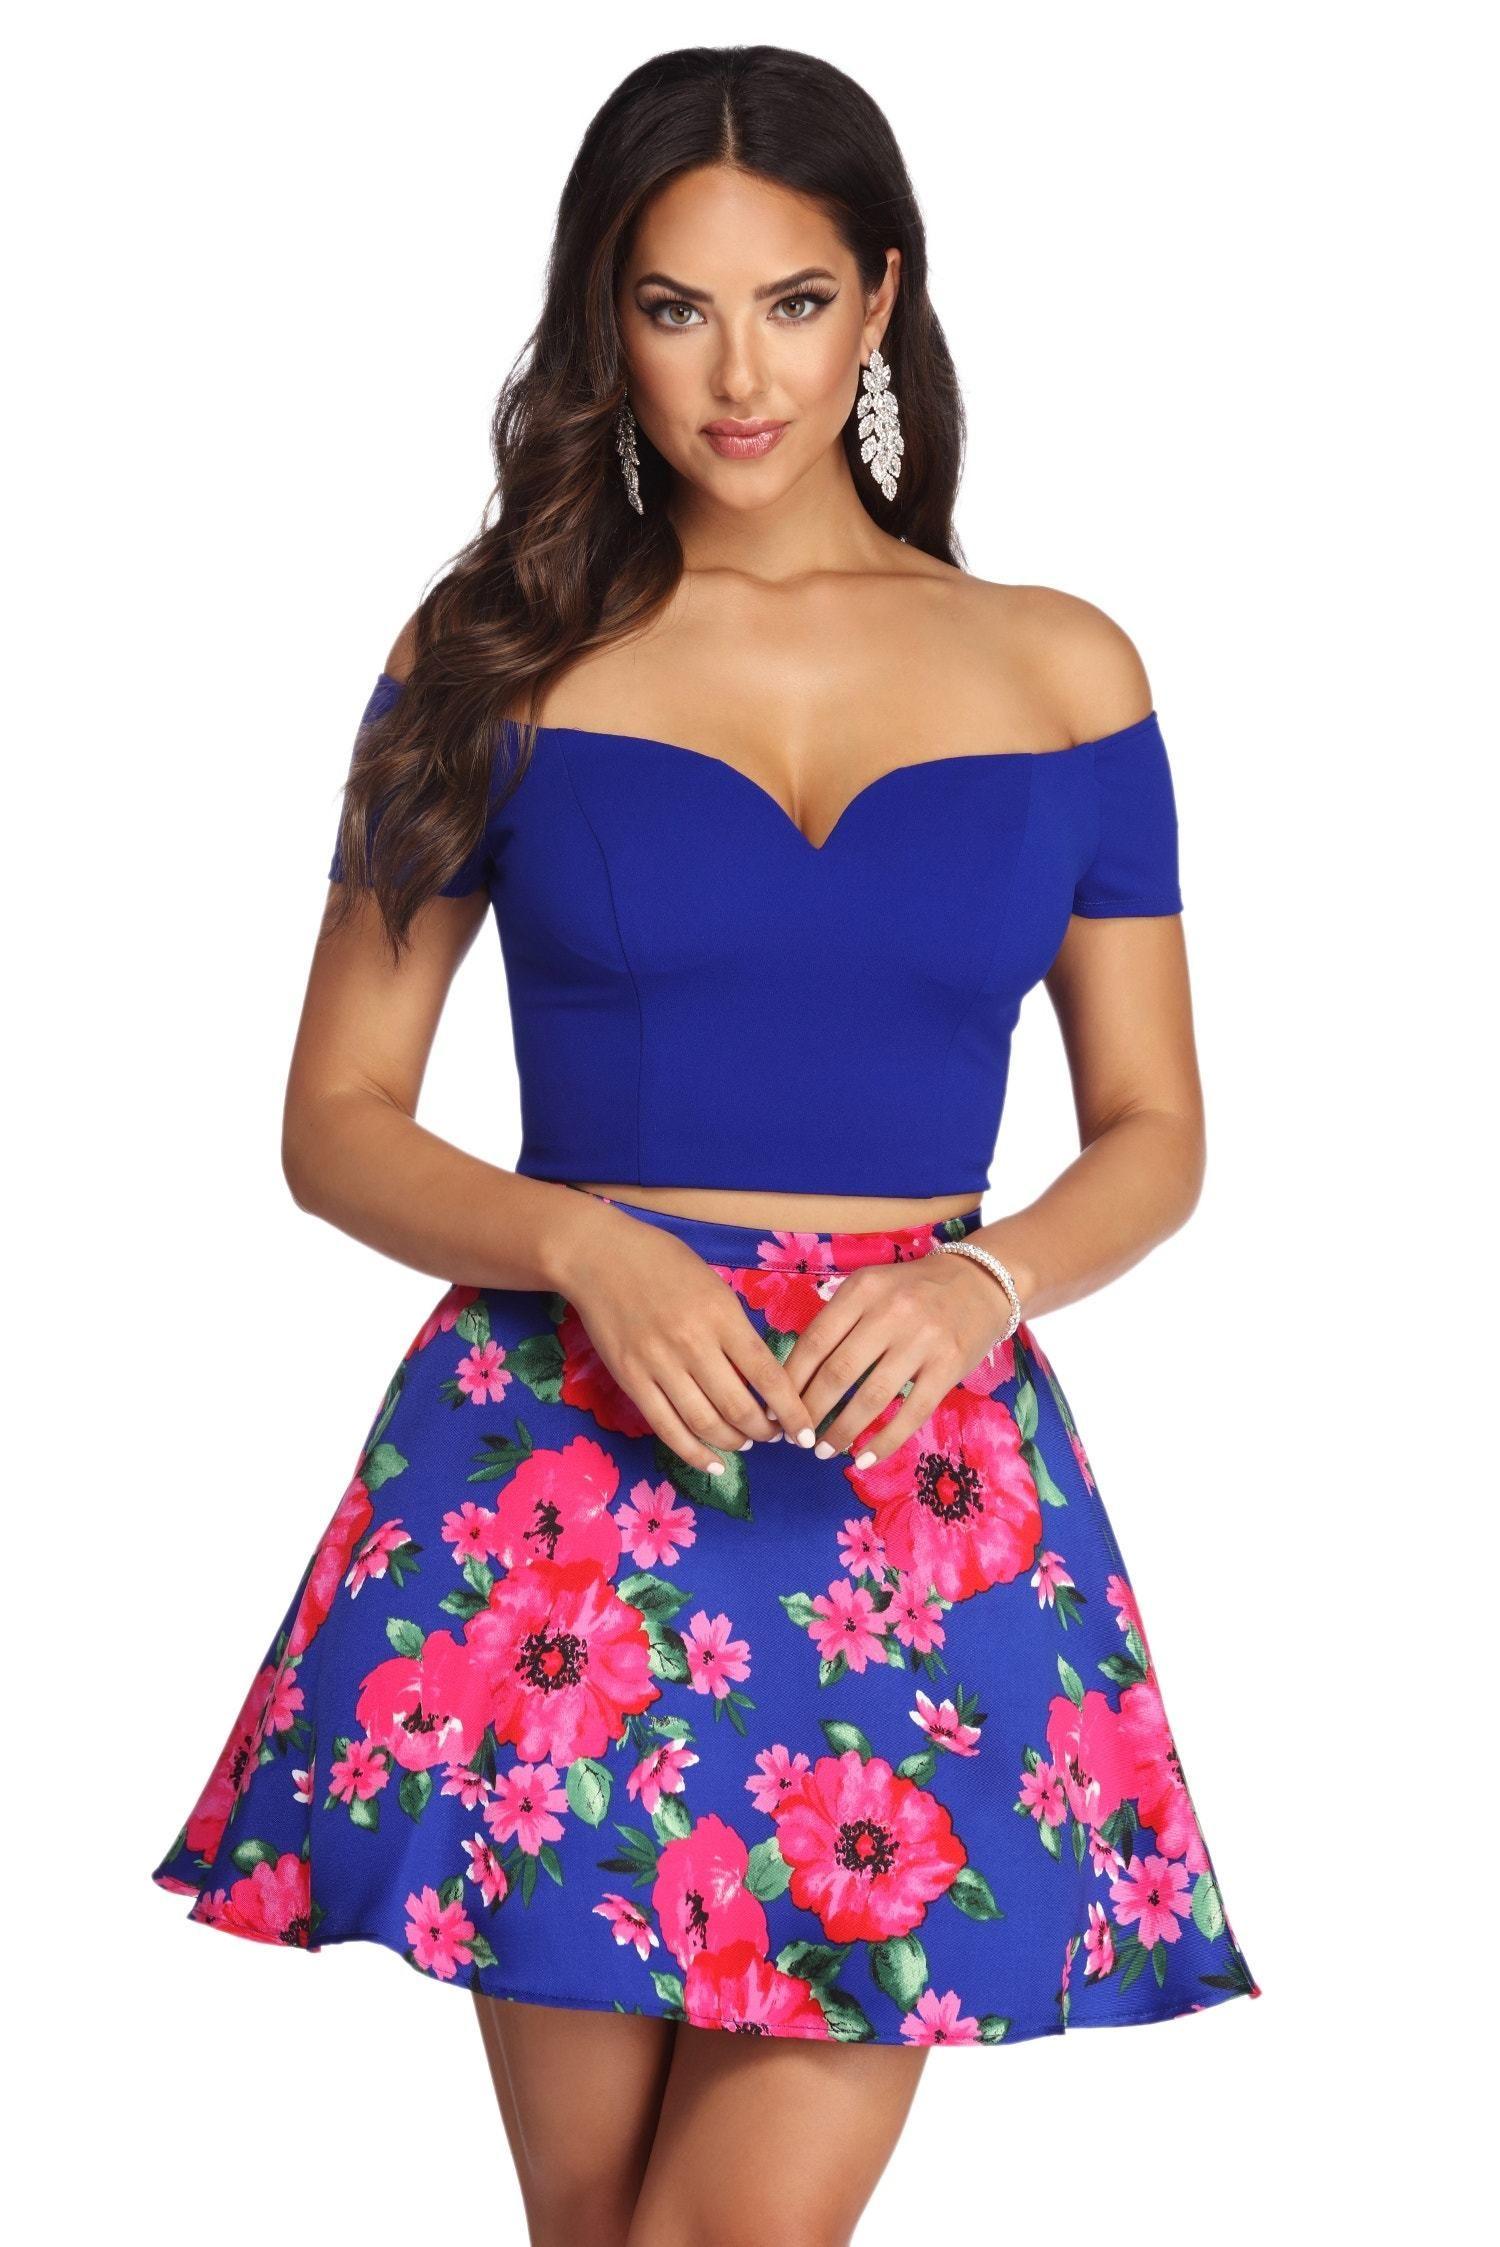 Liz Formal Floral Two Piece Dress Two Piece Dress Piece Dress Floral Two Piece [ 2247 x 1500 Pixel ]